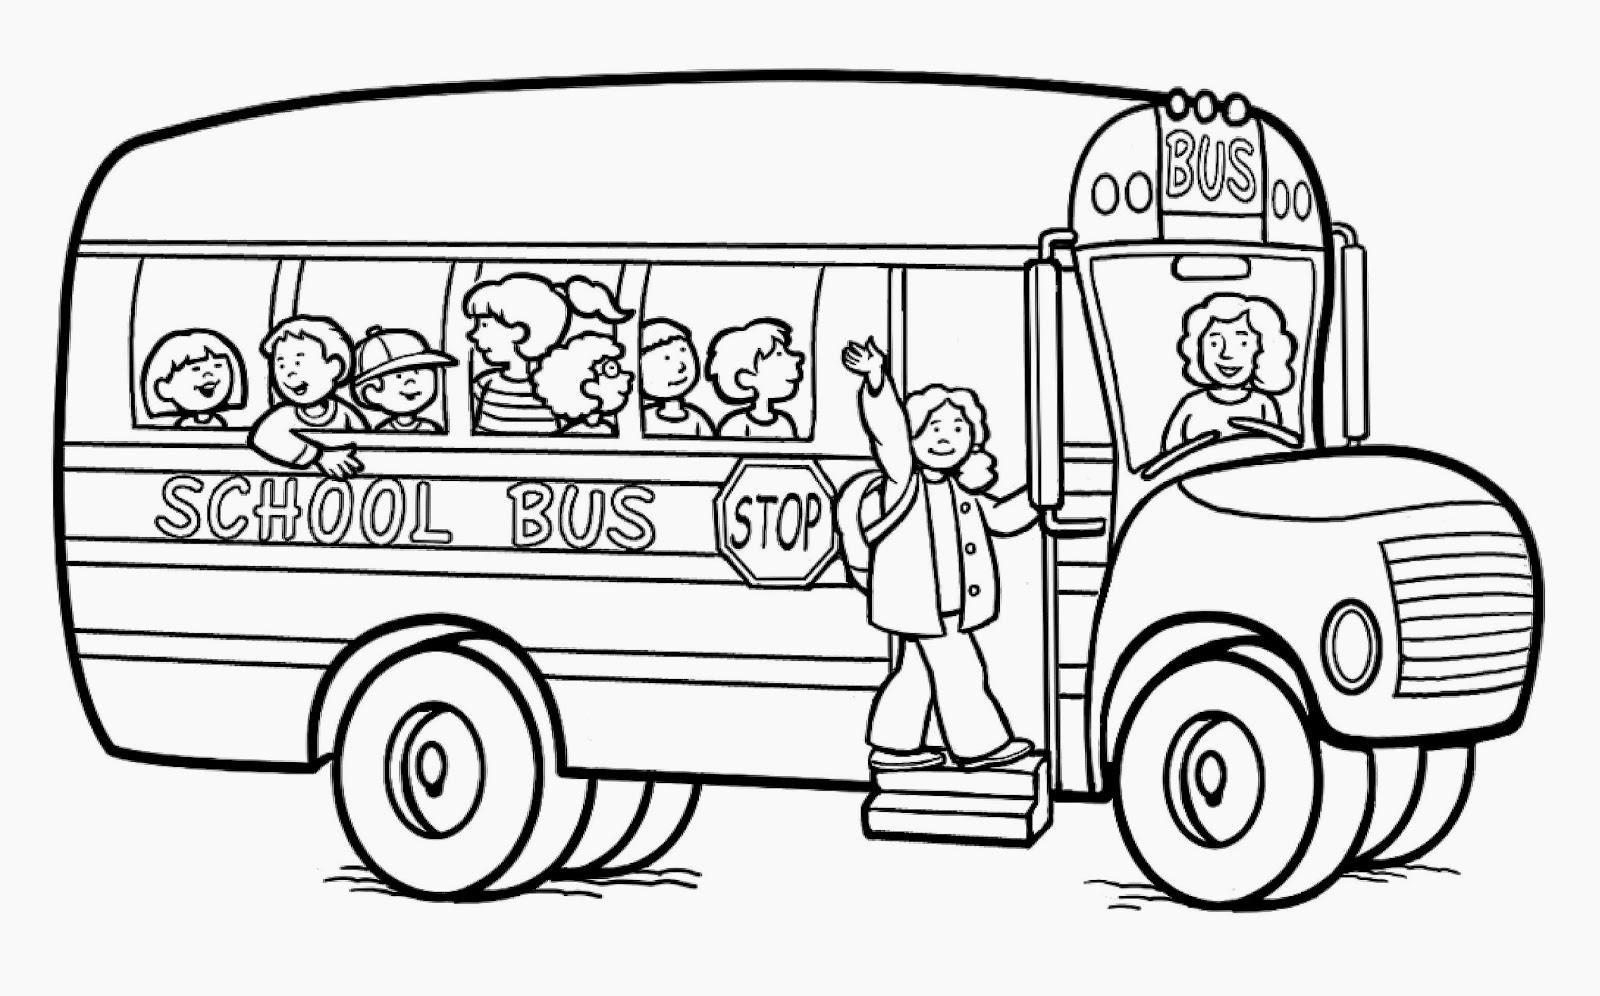 School Bus Coloring Page Printable Coloring Pages Exquisite School Coloring Pages Bus Page